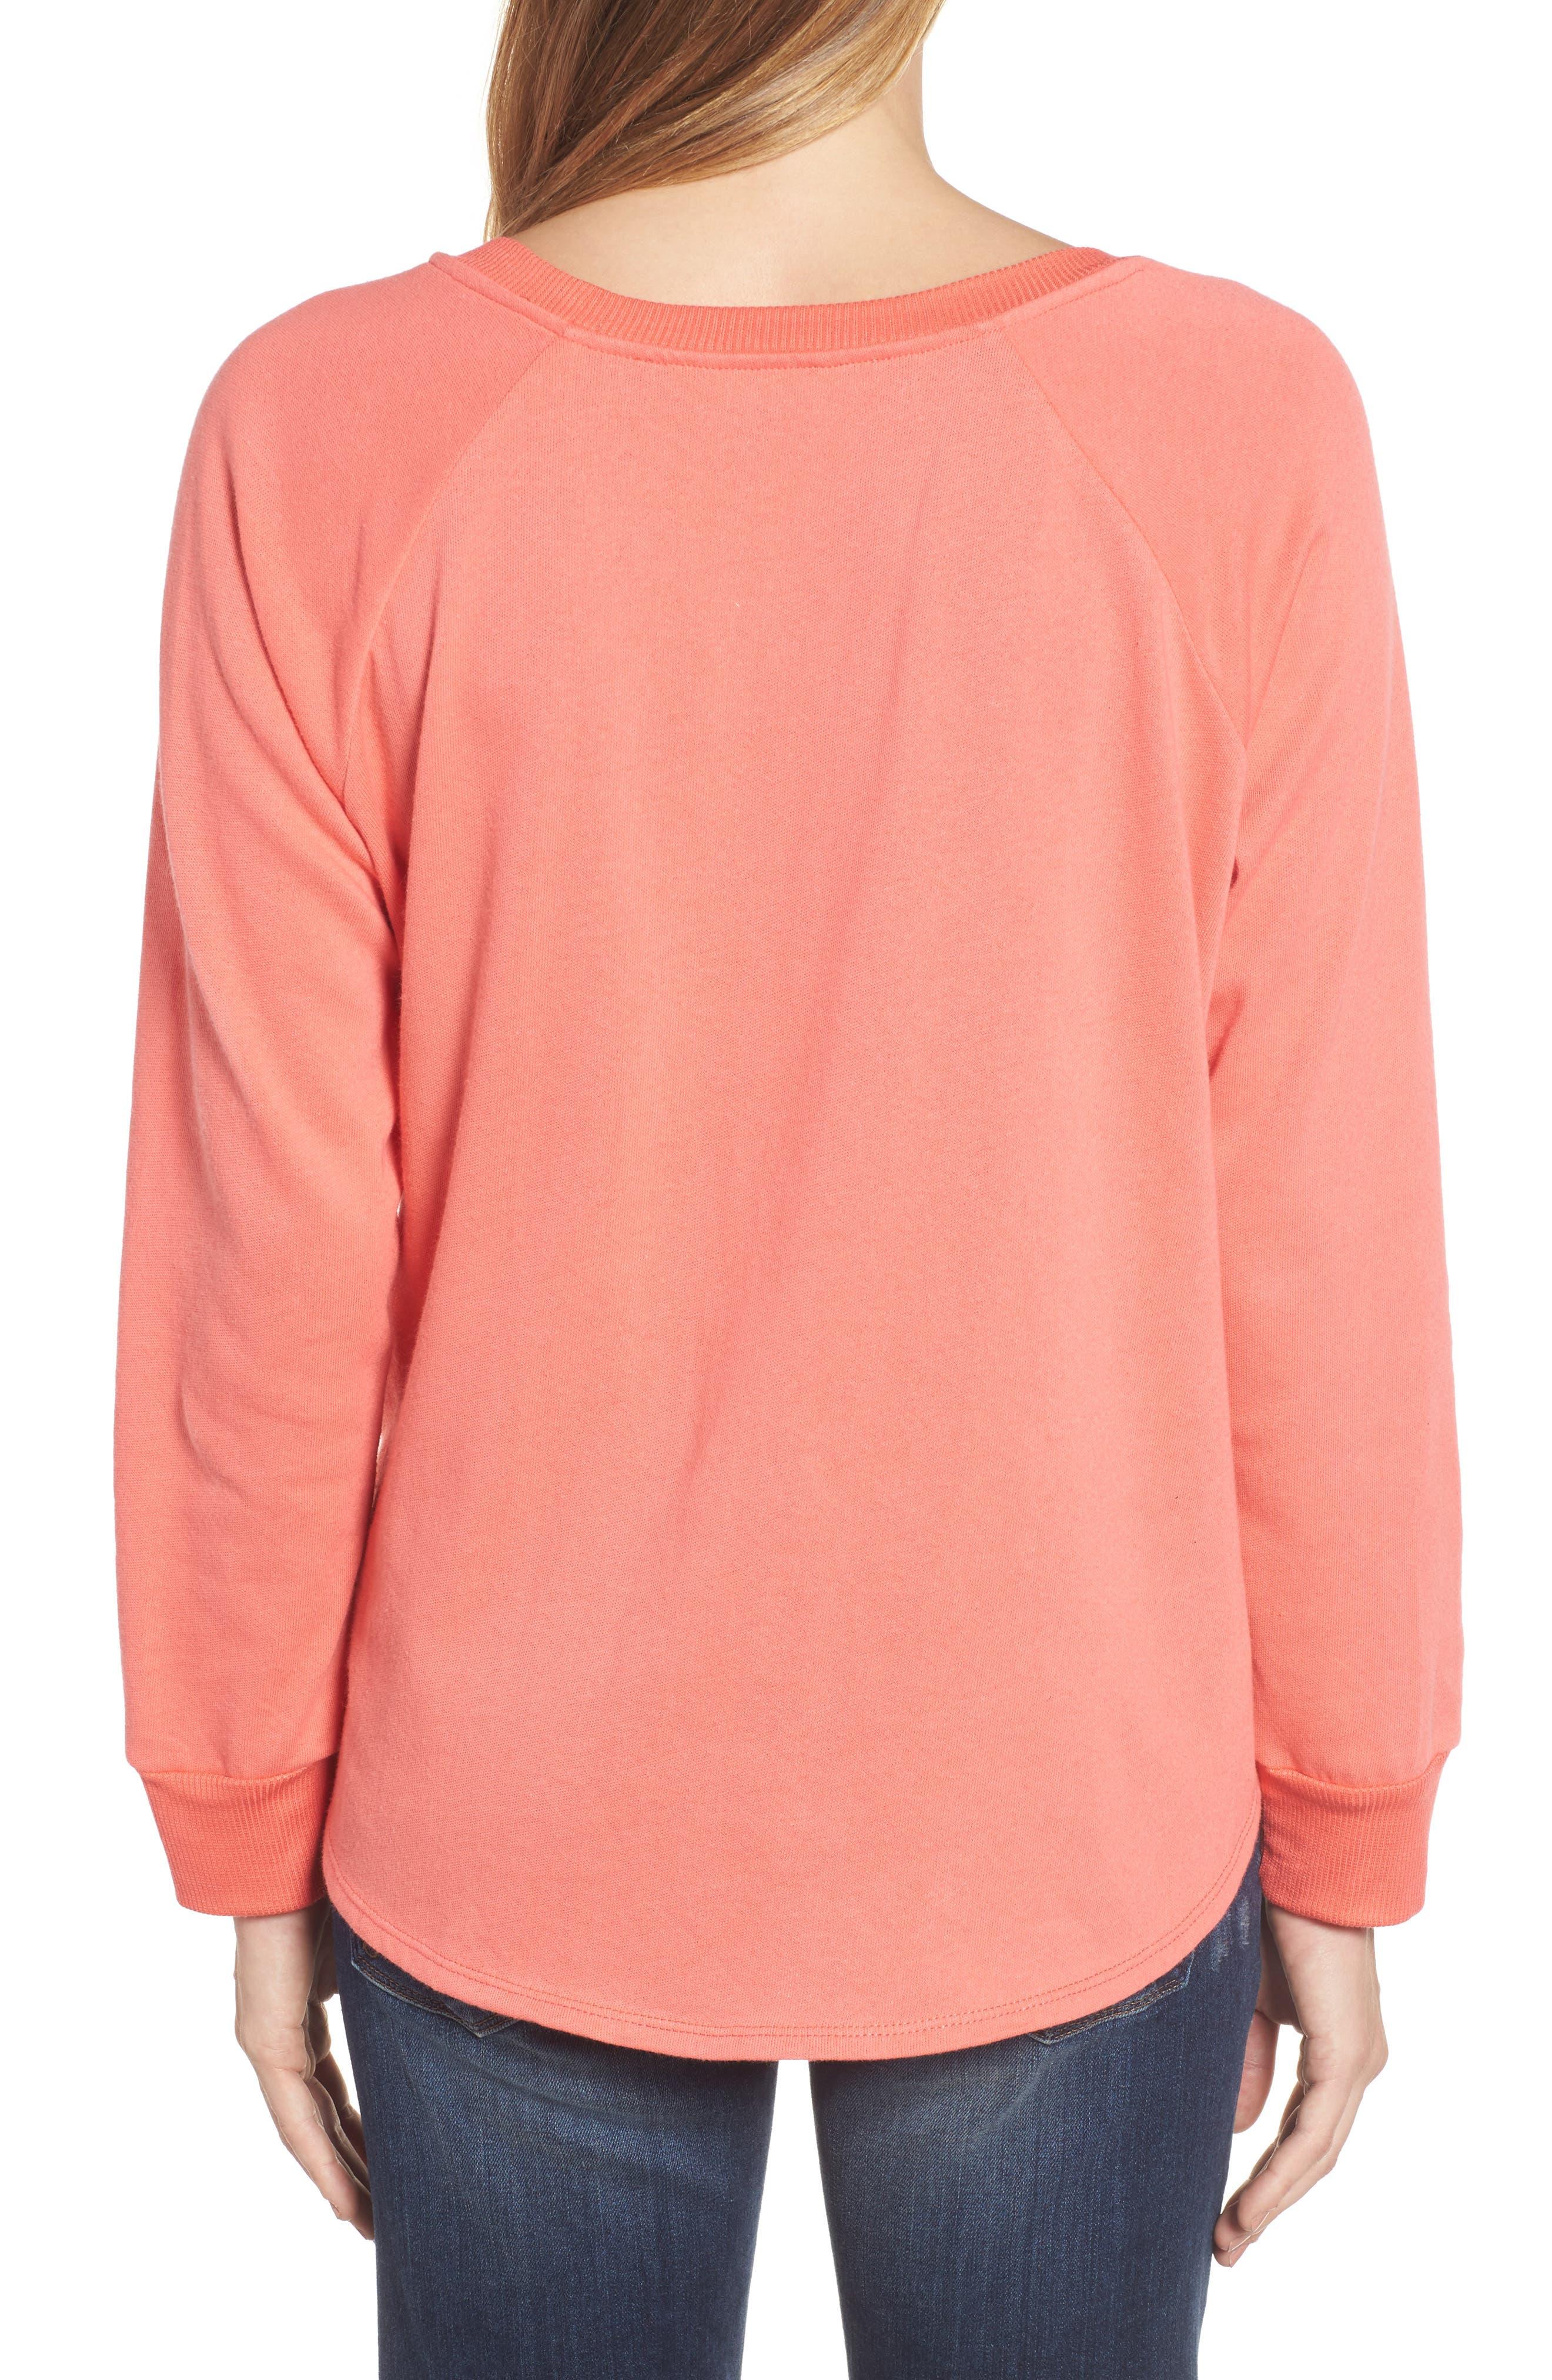 Alternate Image 2  - Caslon® Tie Front Cotton Blend Sweatshirt (Regular & Petite)